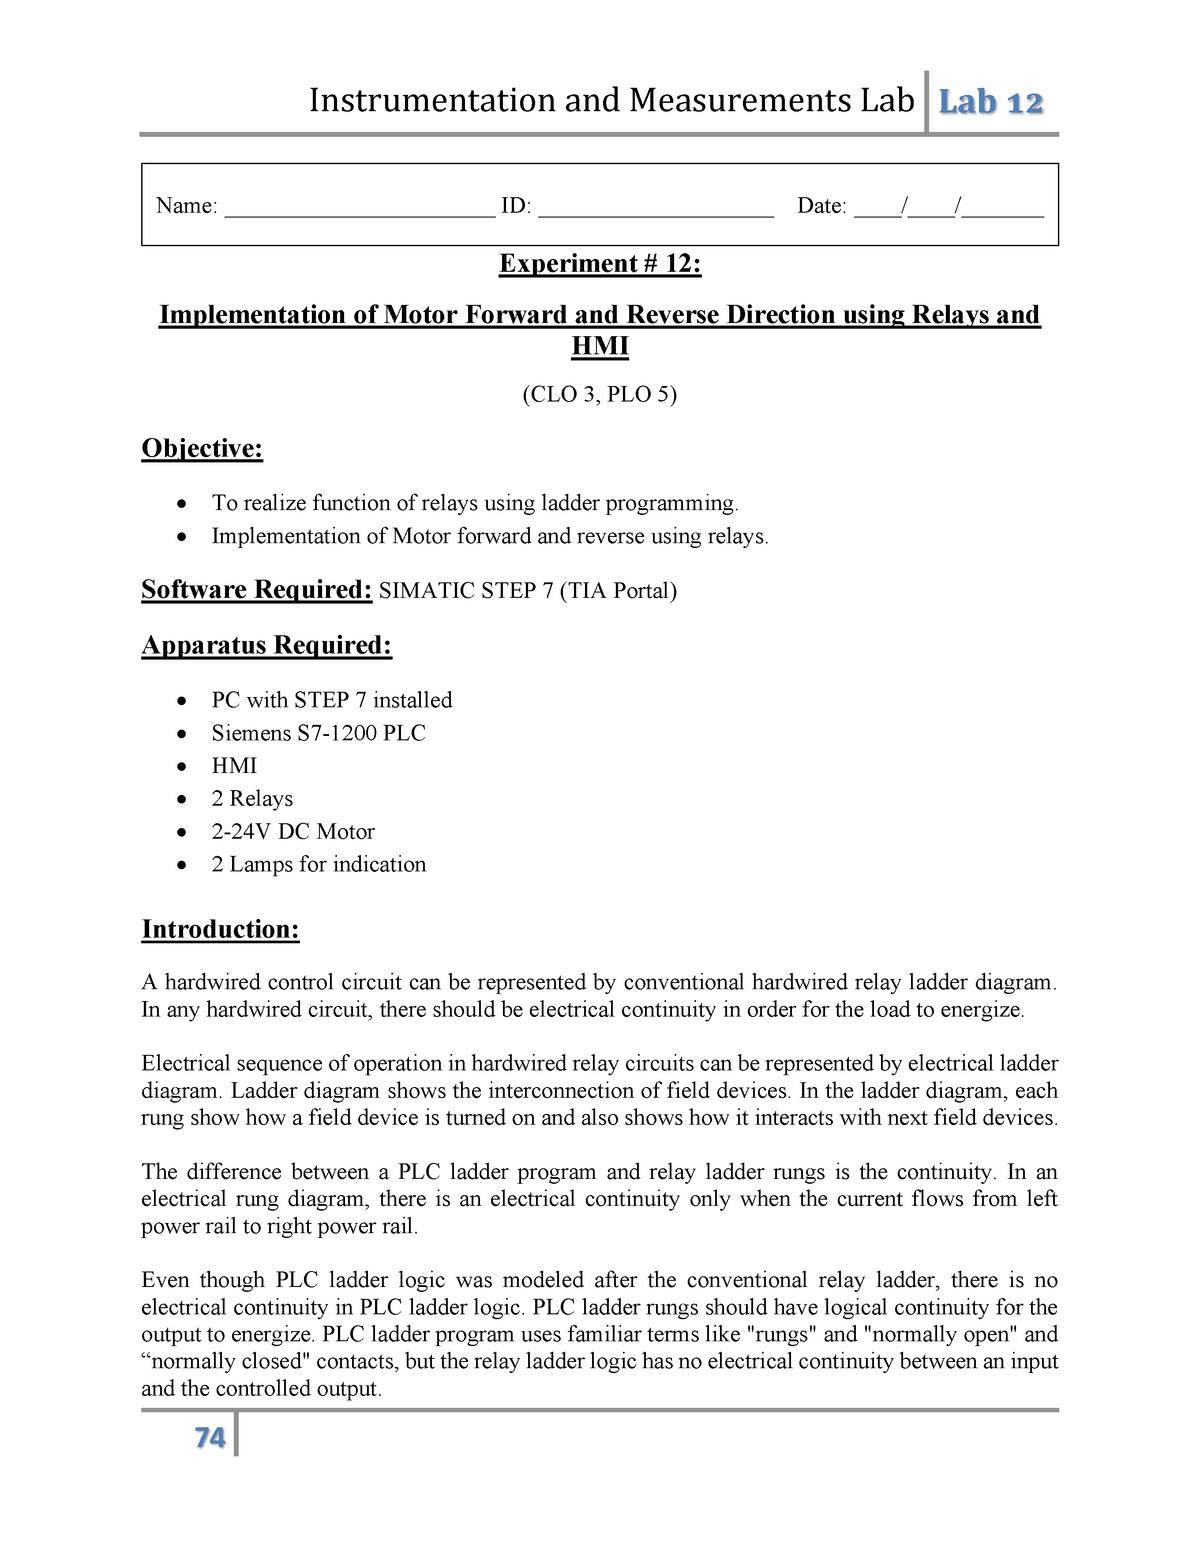 Lab 12 Instrumentation And Measurements Lab Manual Studocu